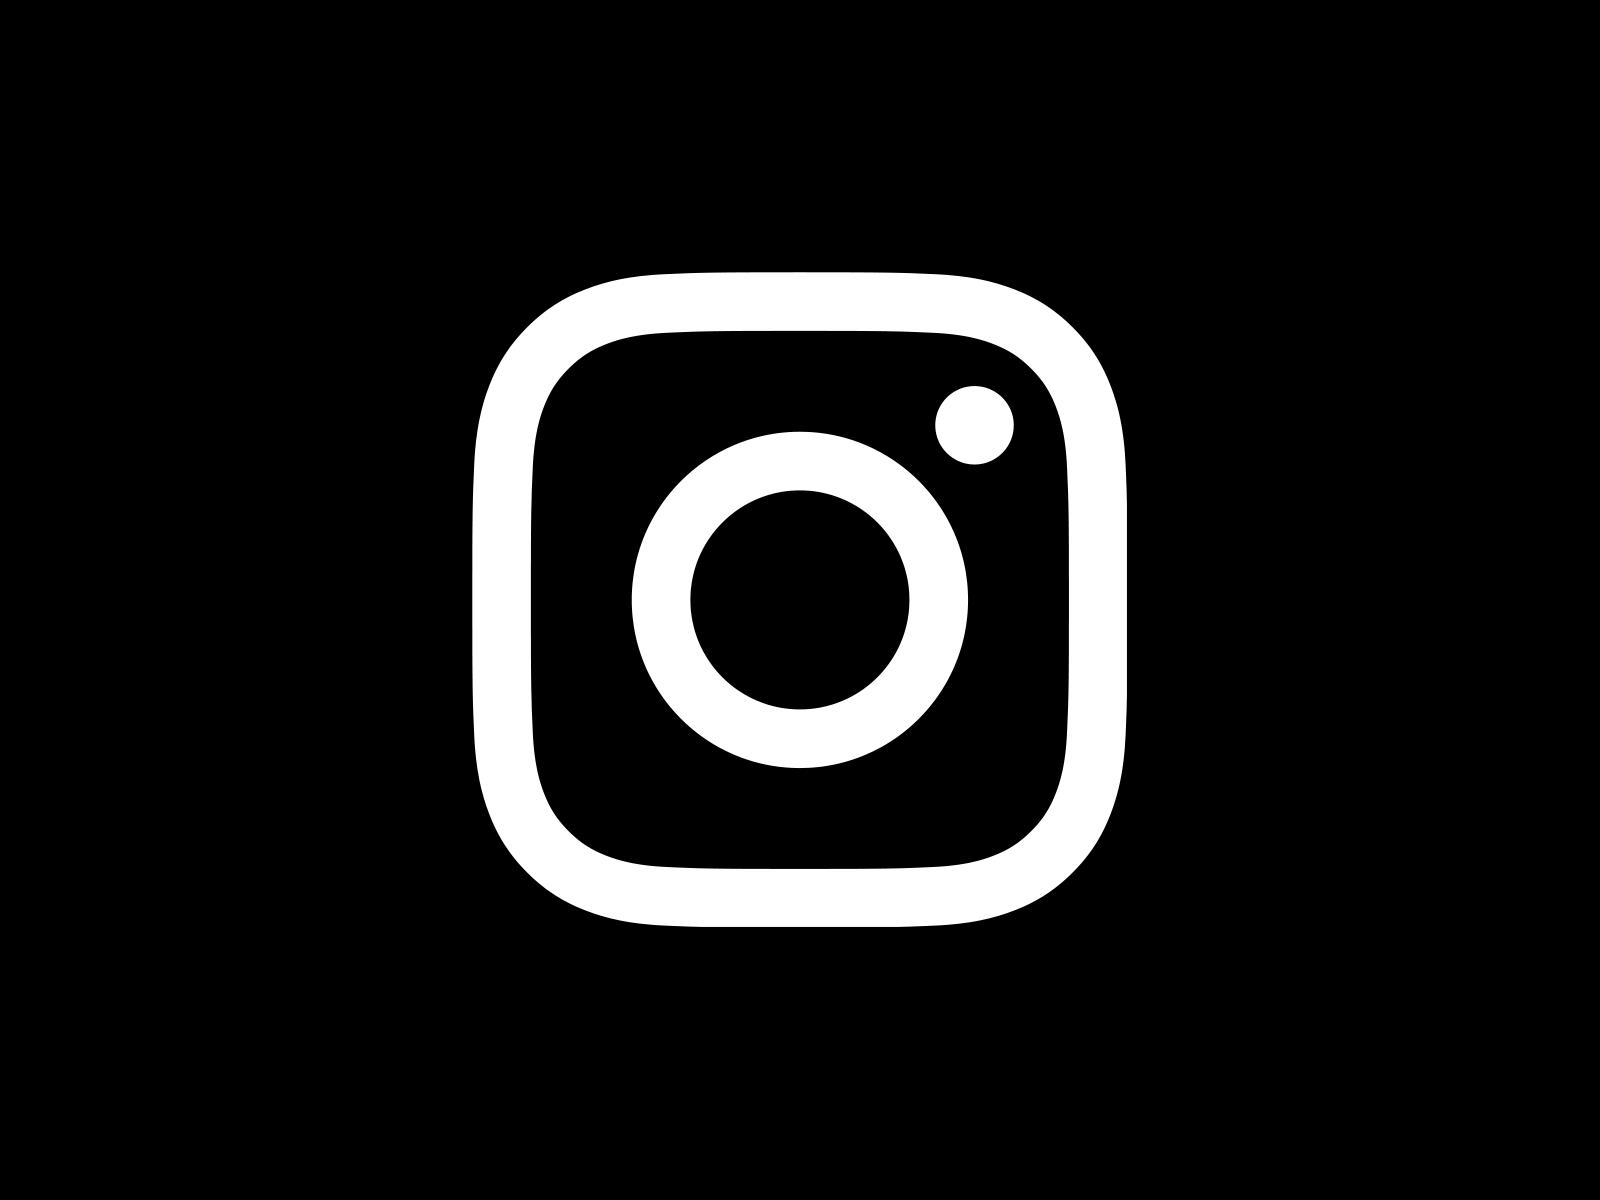 Instagram Icon White On Black Circle - Instagram Logo Eps PNG